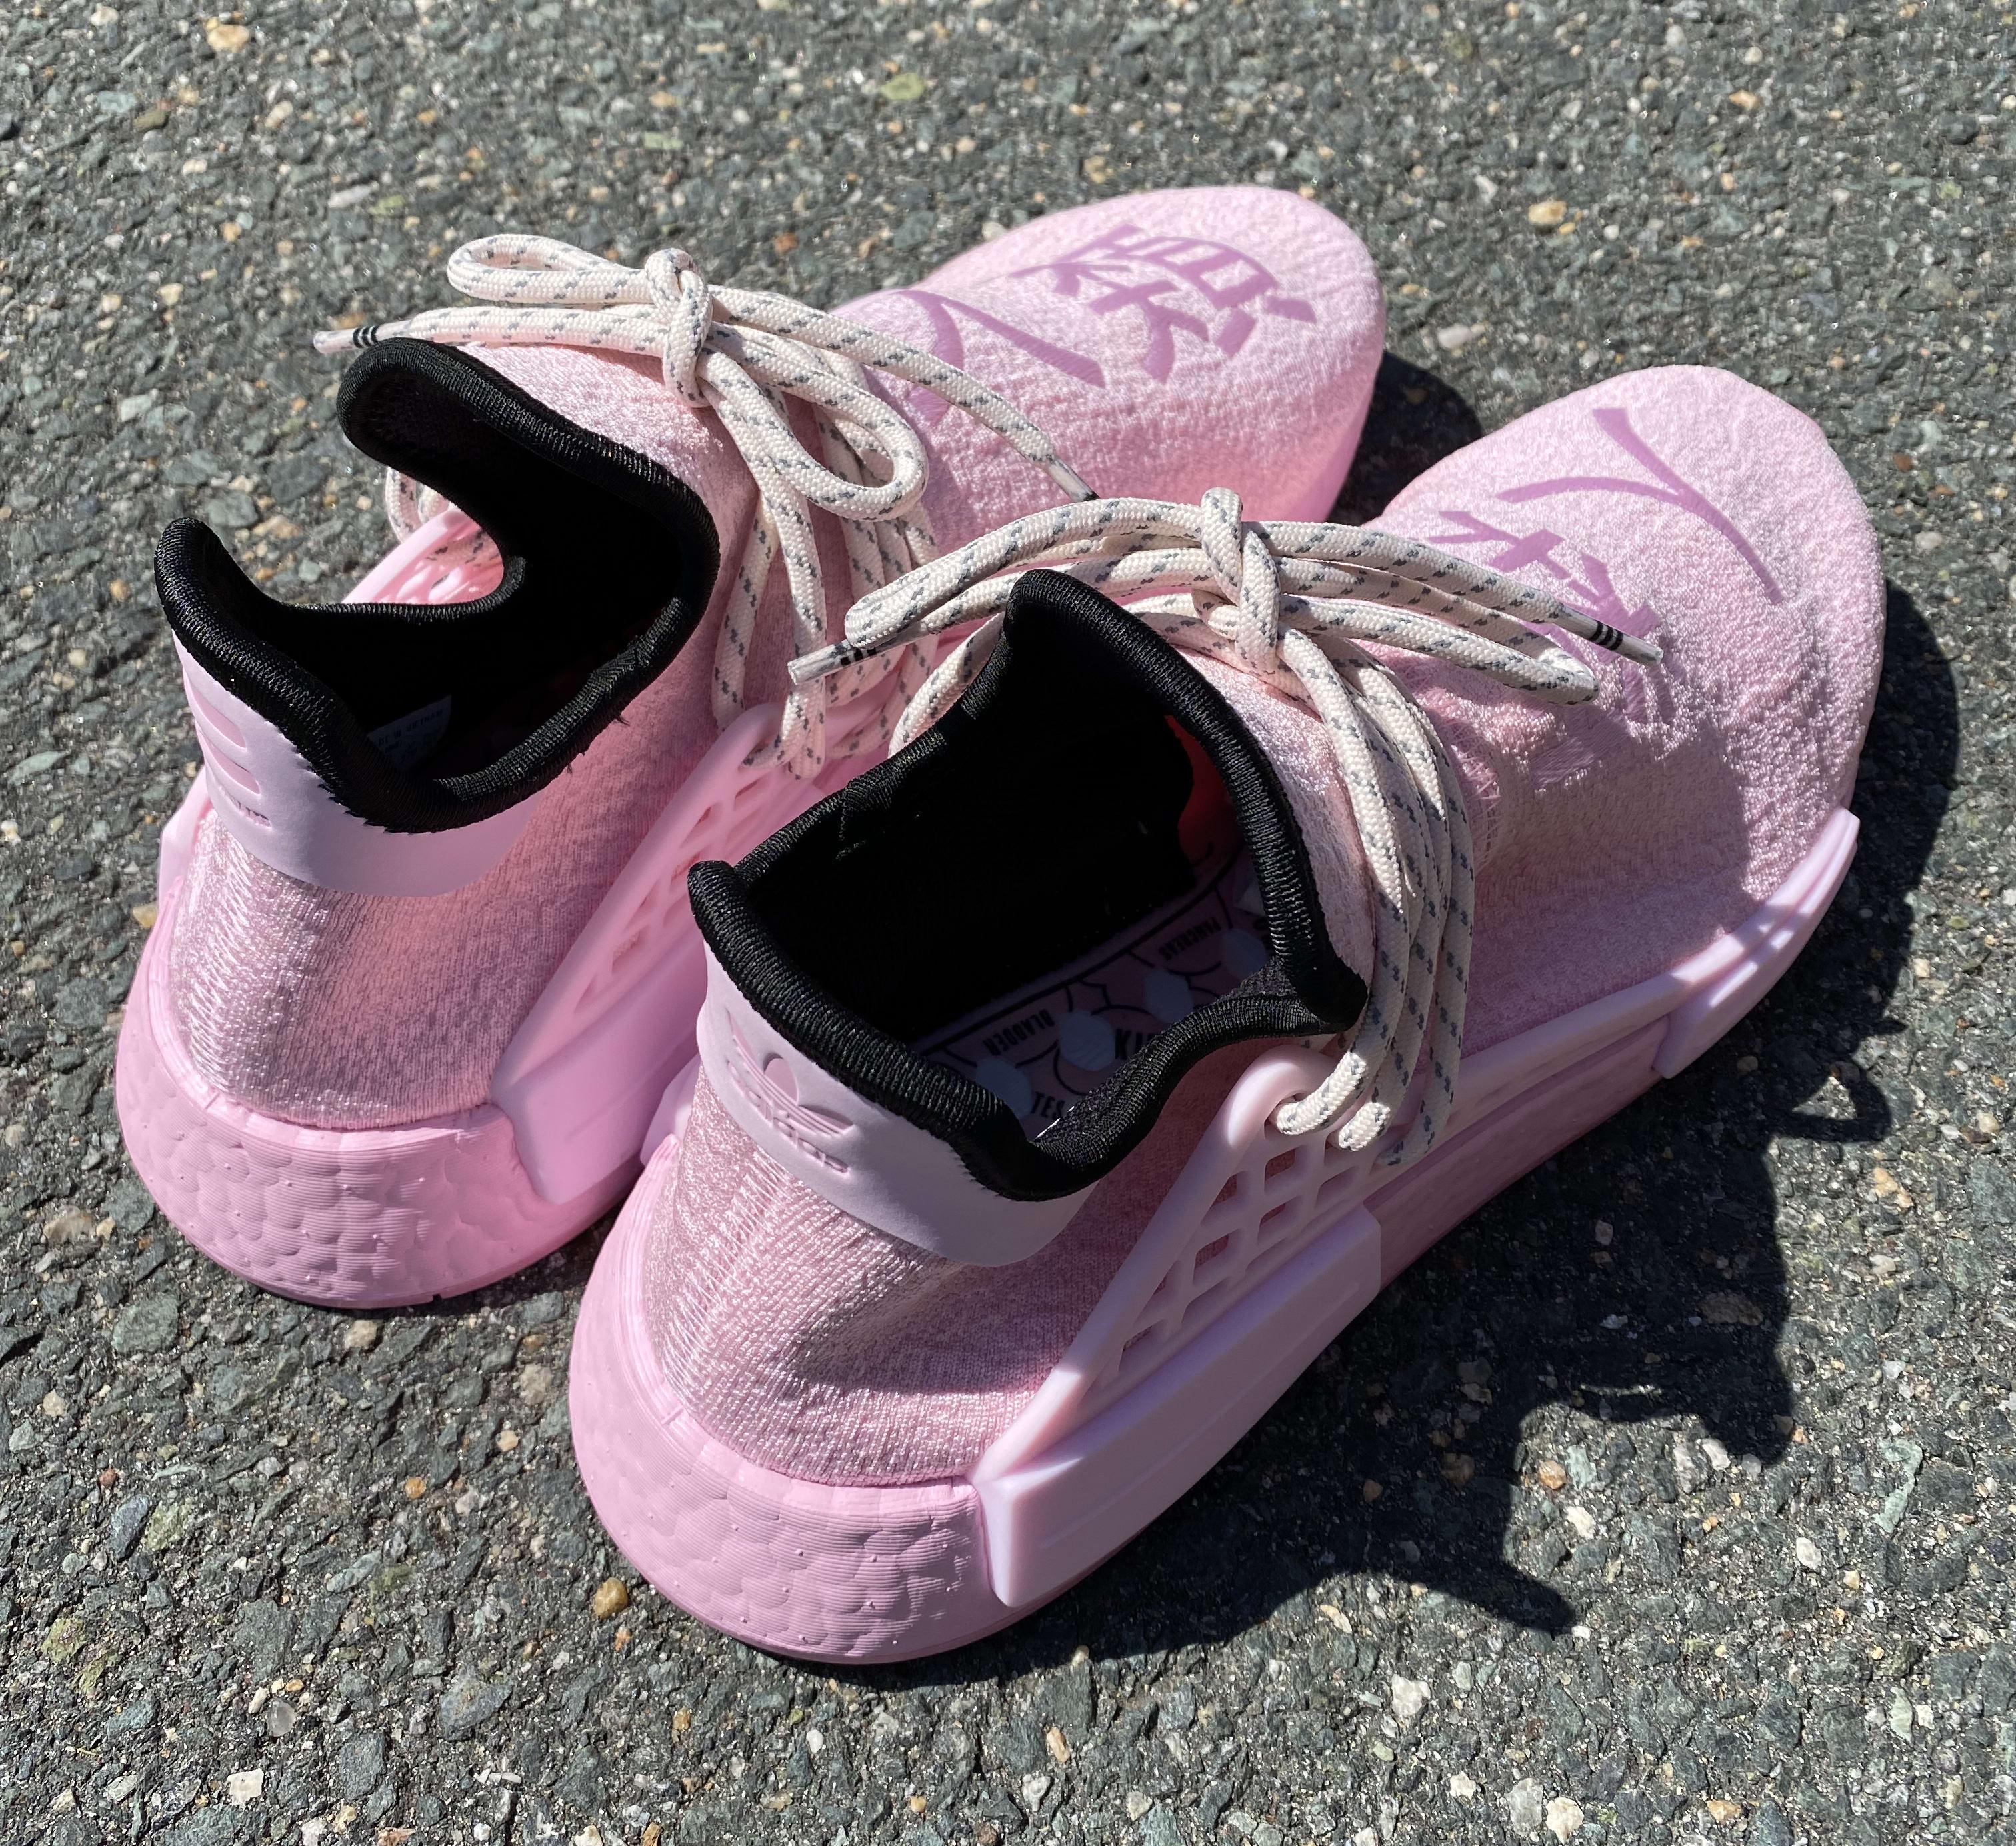 Pharrell x Adidas NMD Hu 'Pink' GY0088 Heel